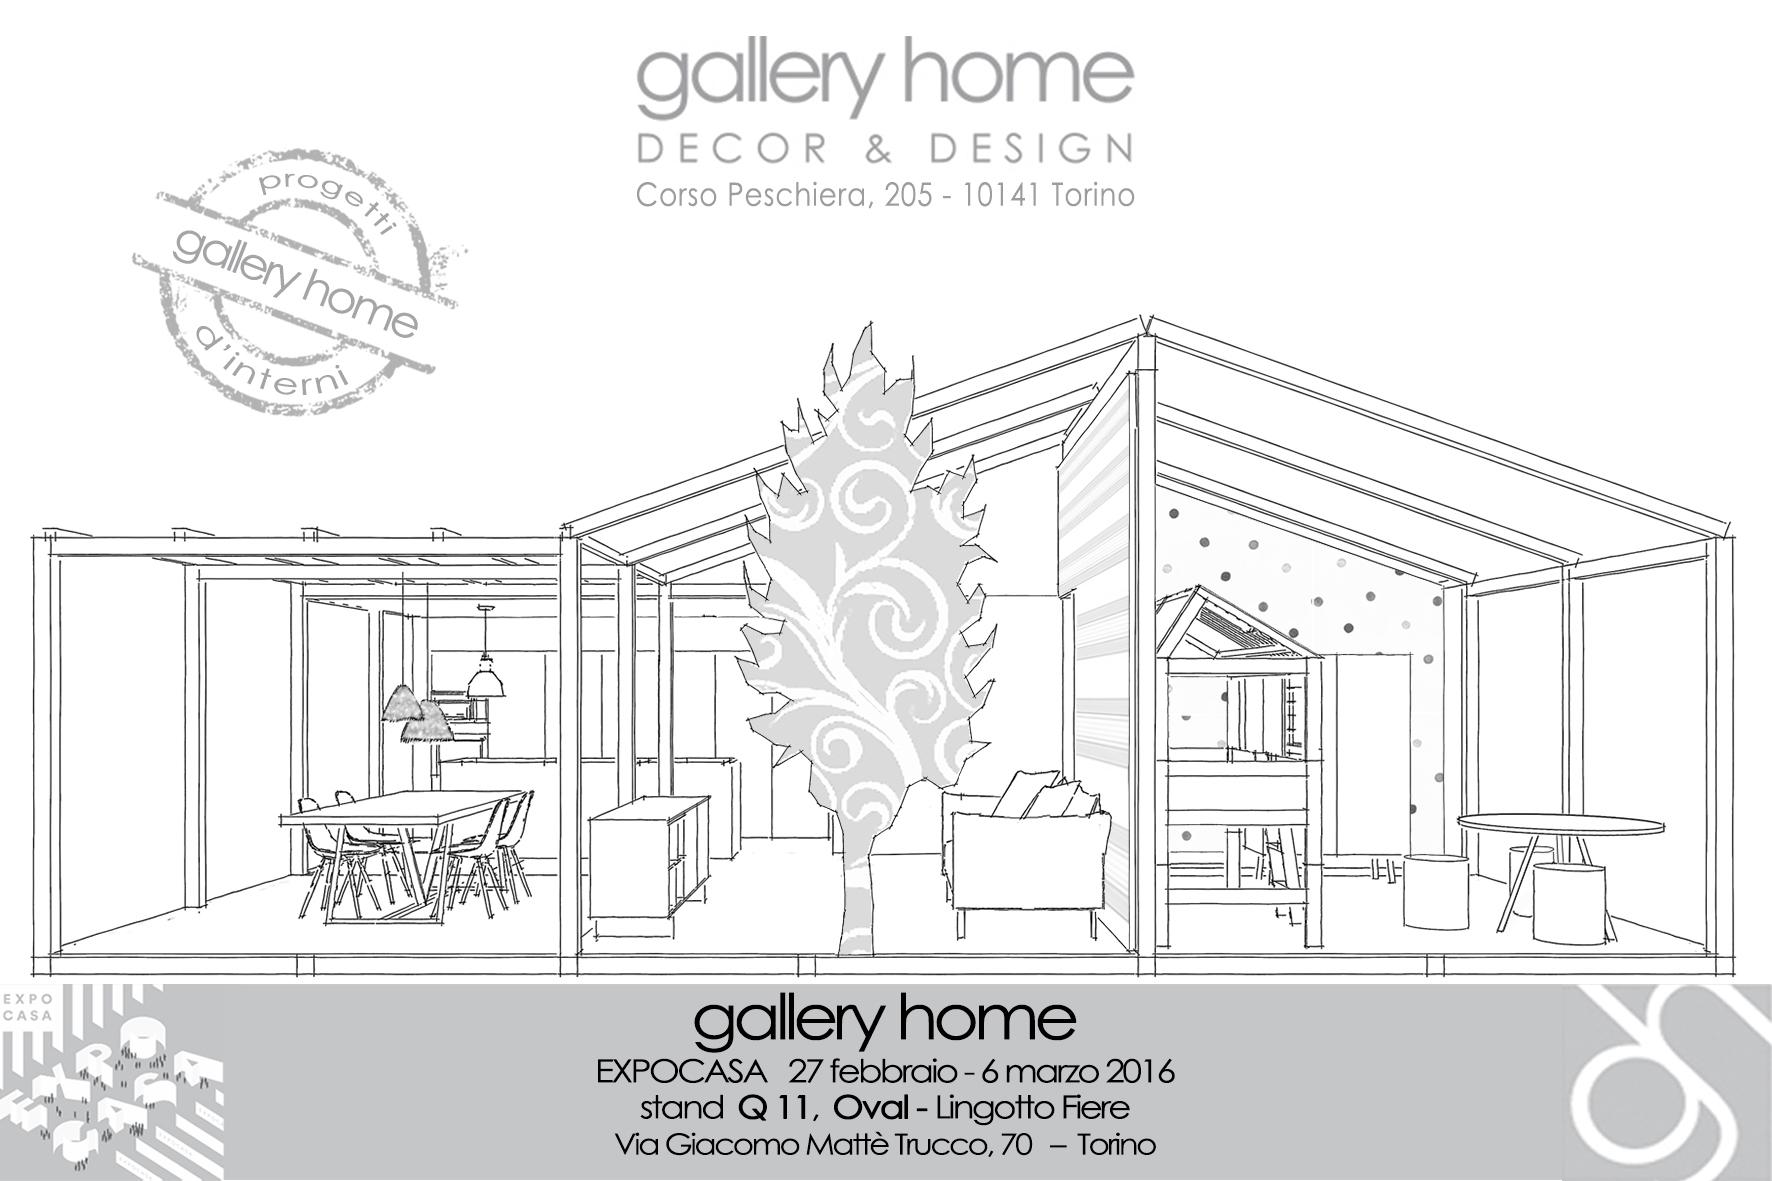 Gallery Home Expocasa 2016